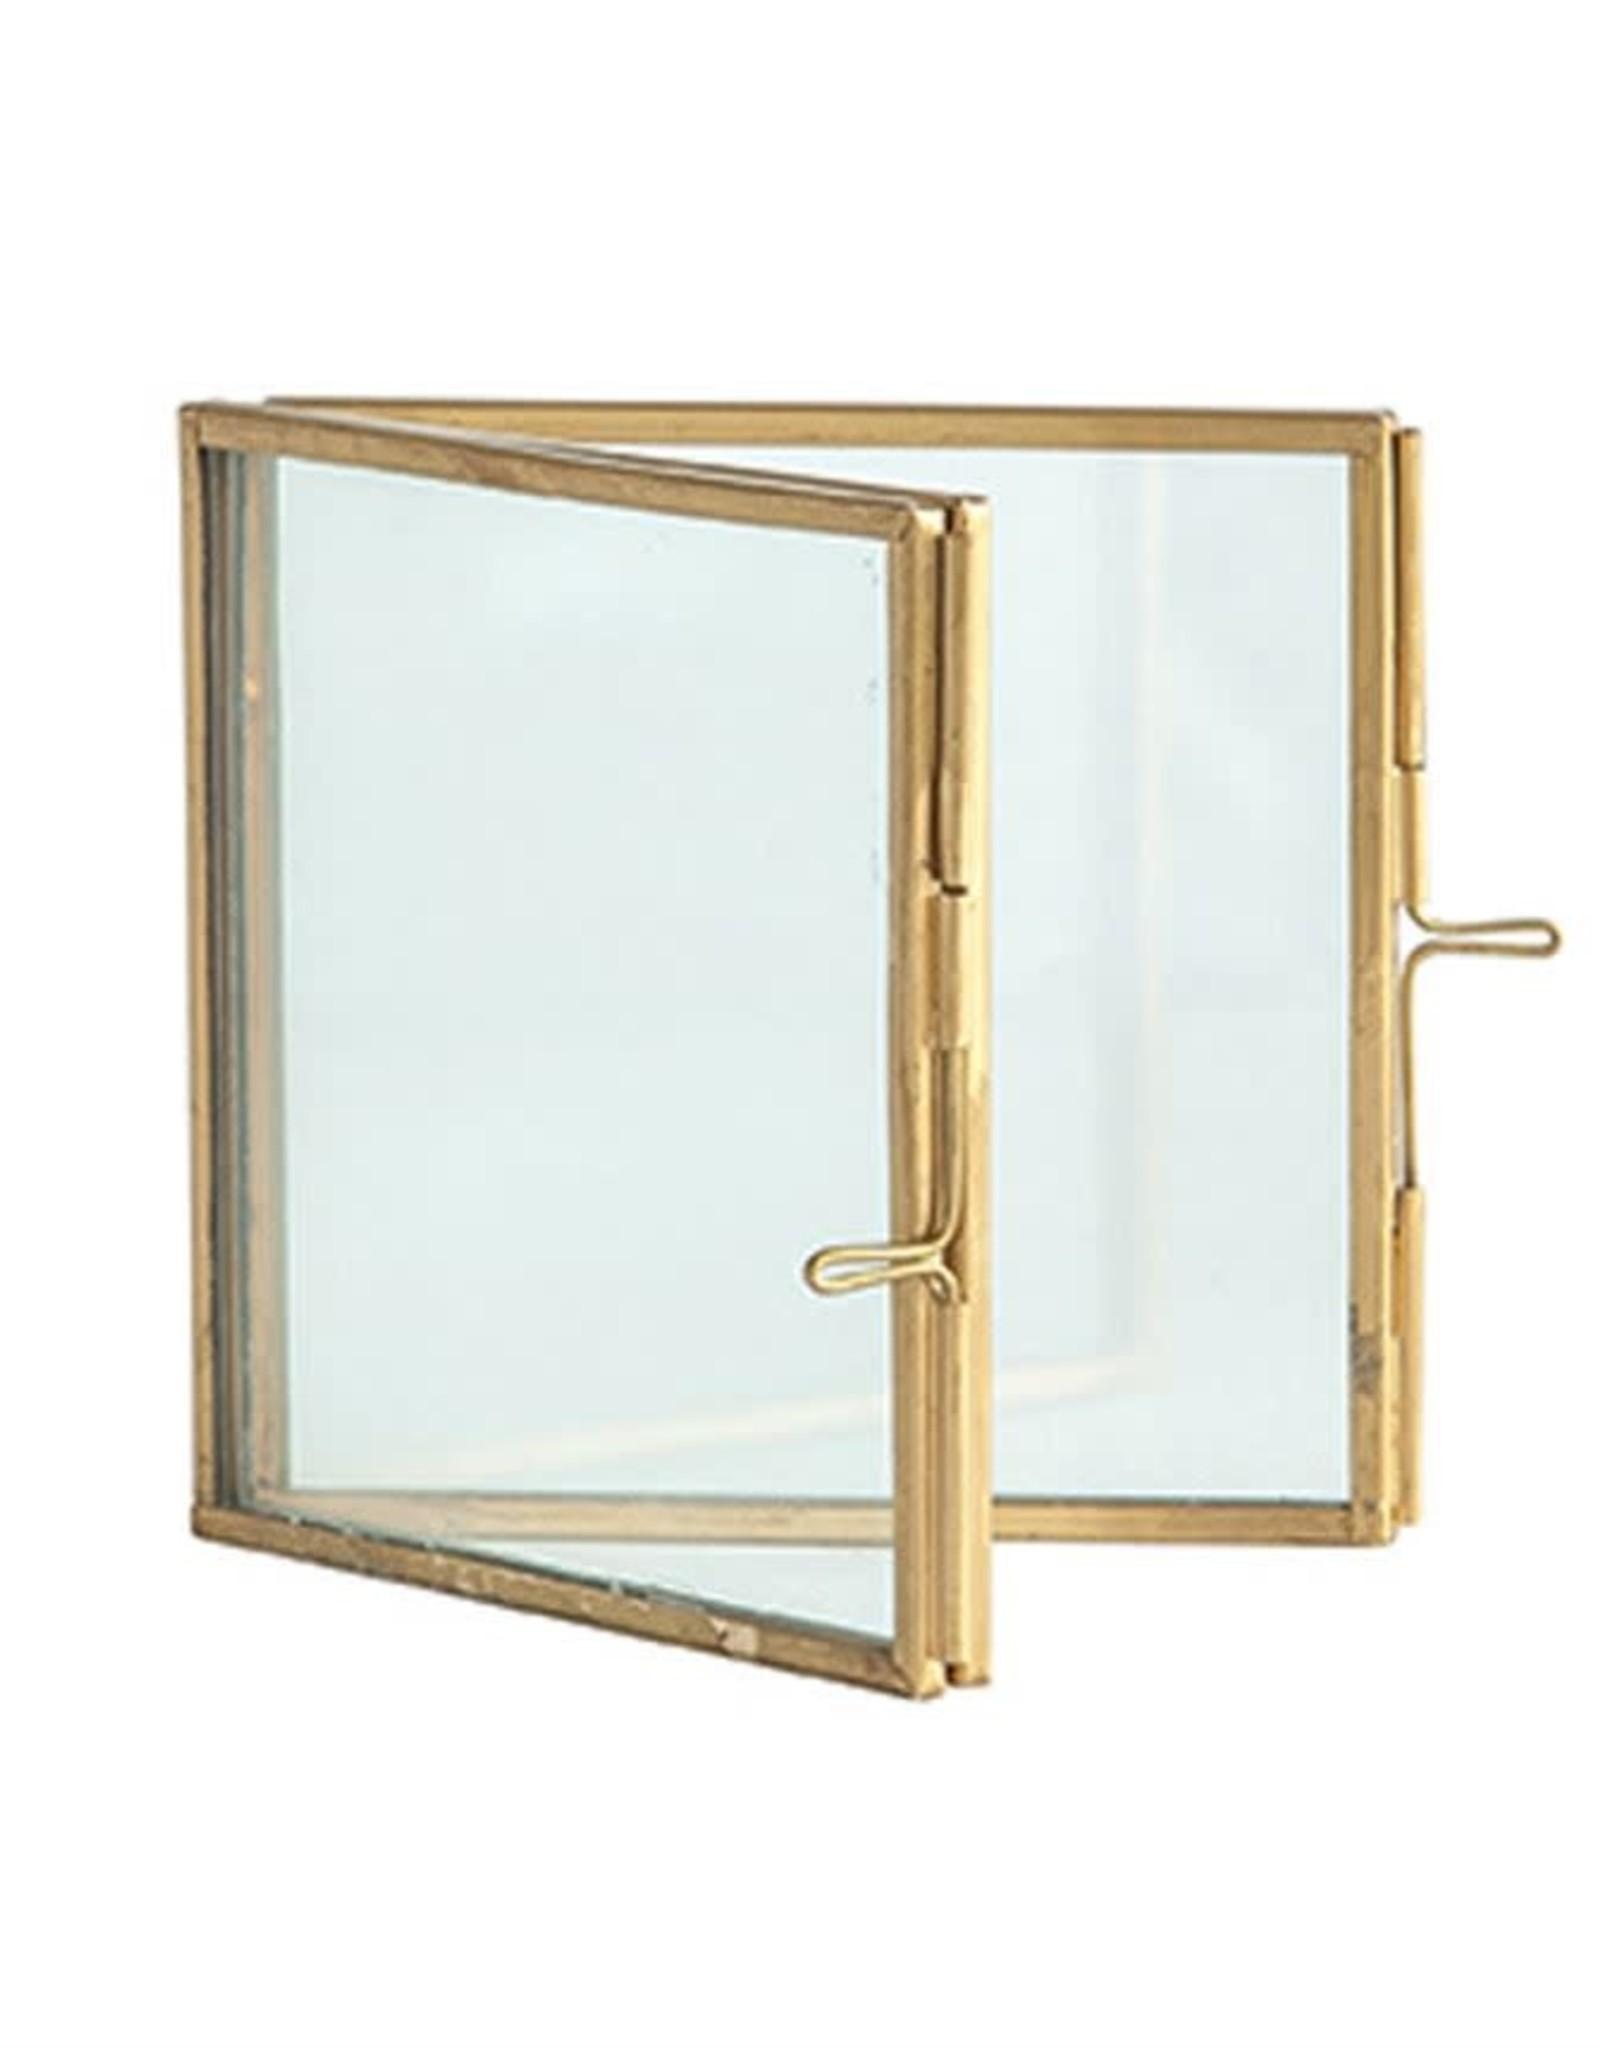 Hinged Brass & Glass Photo Frame - 4x4